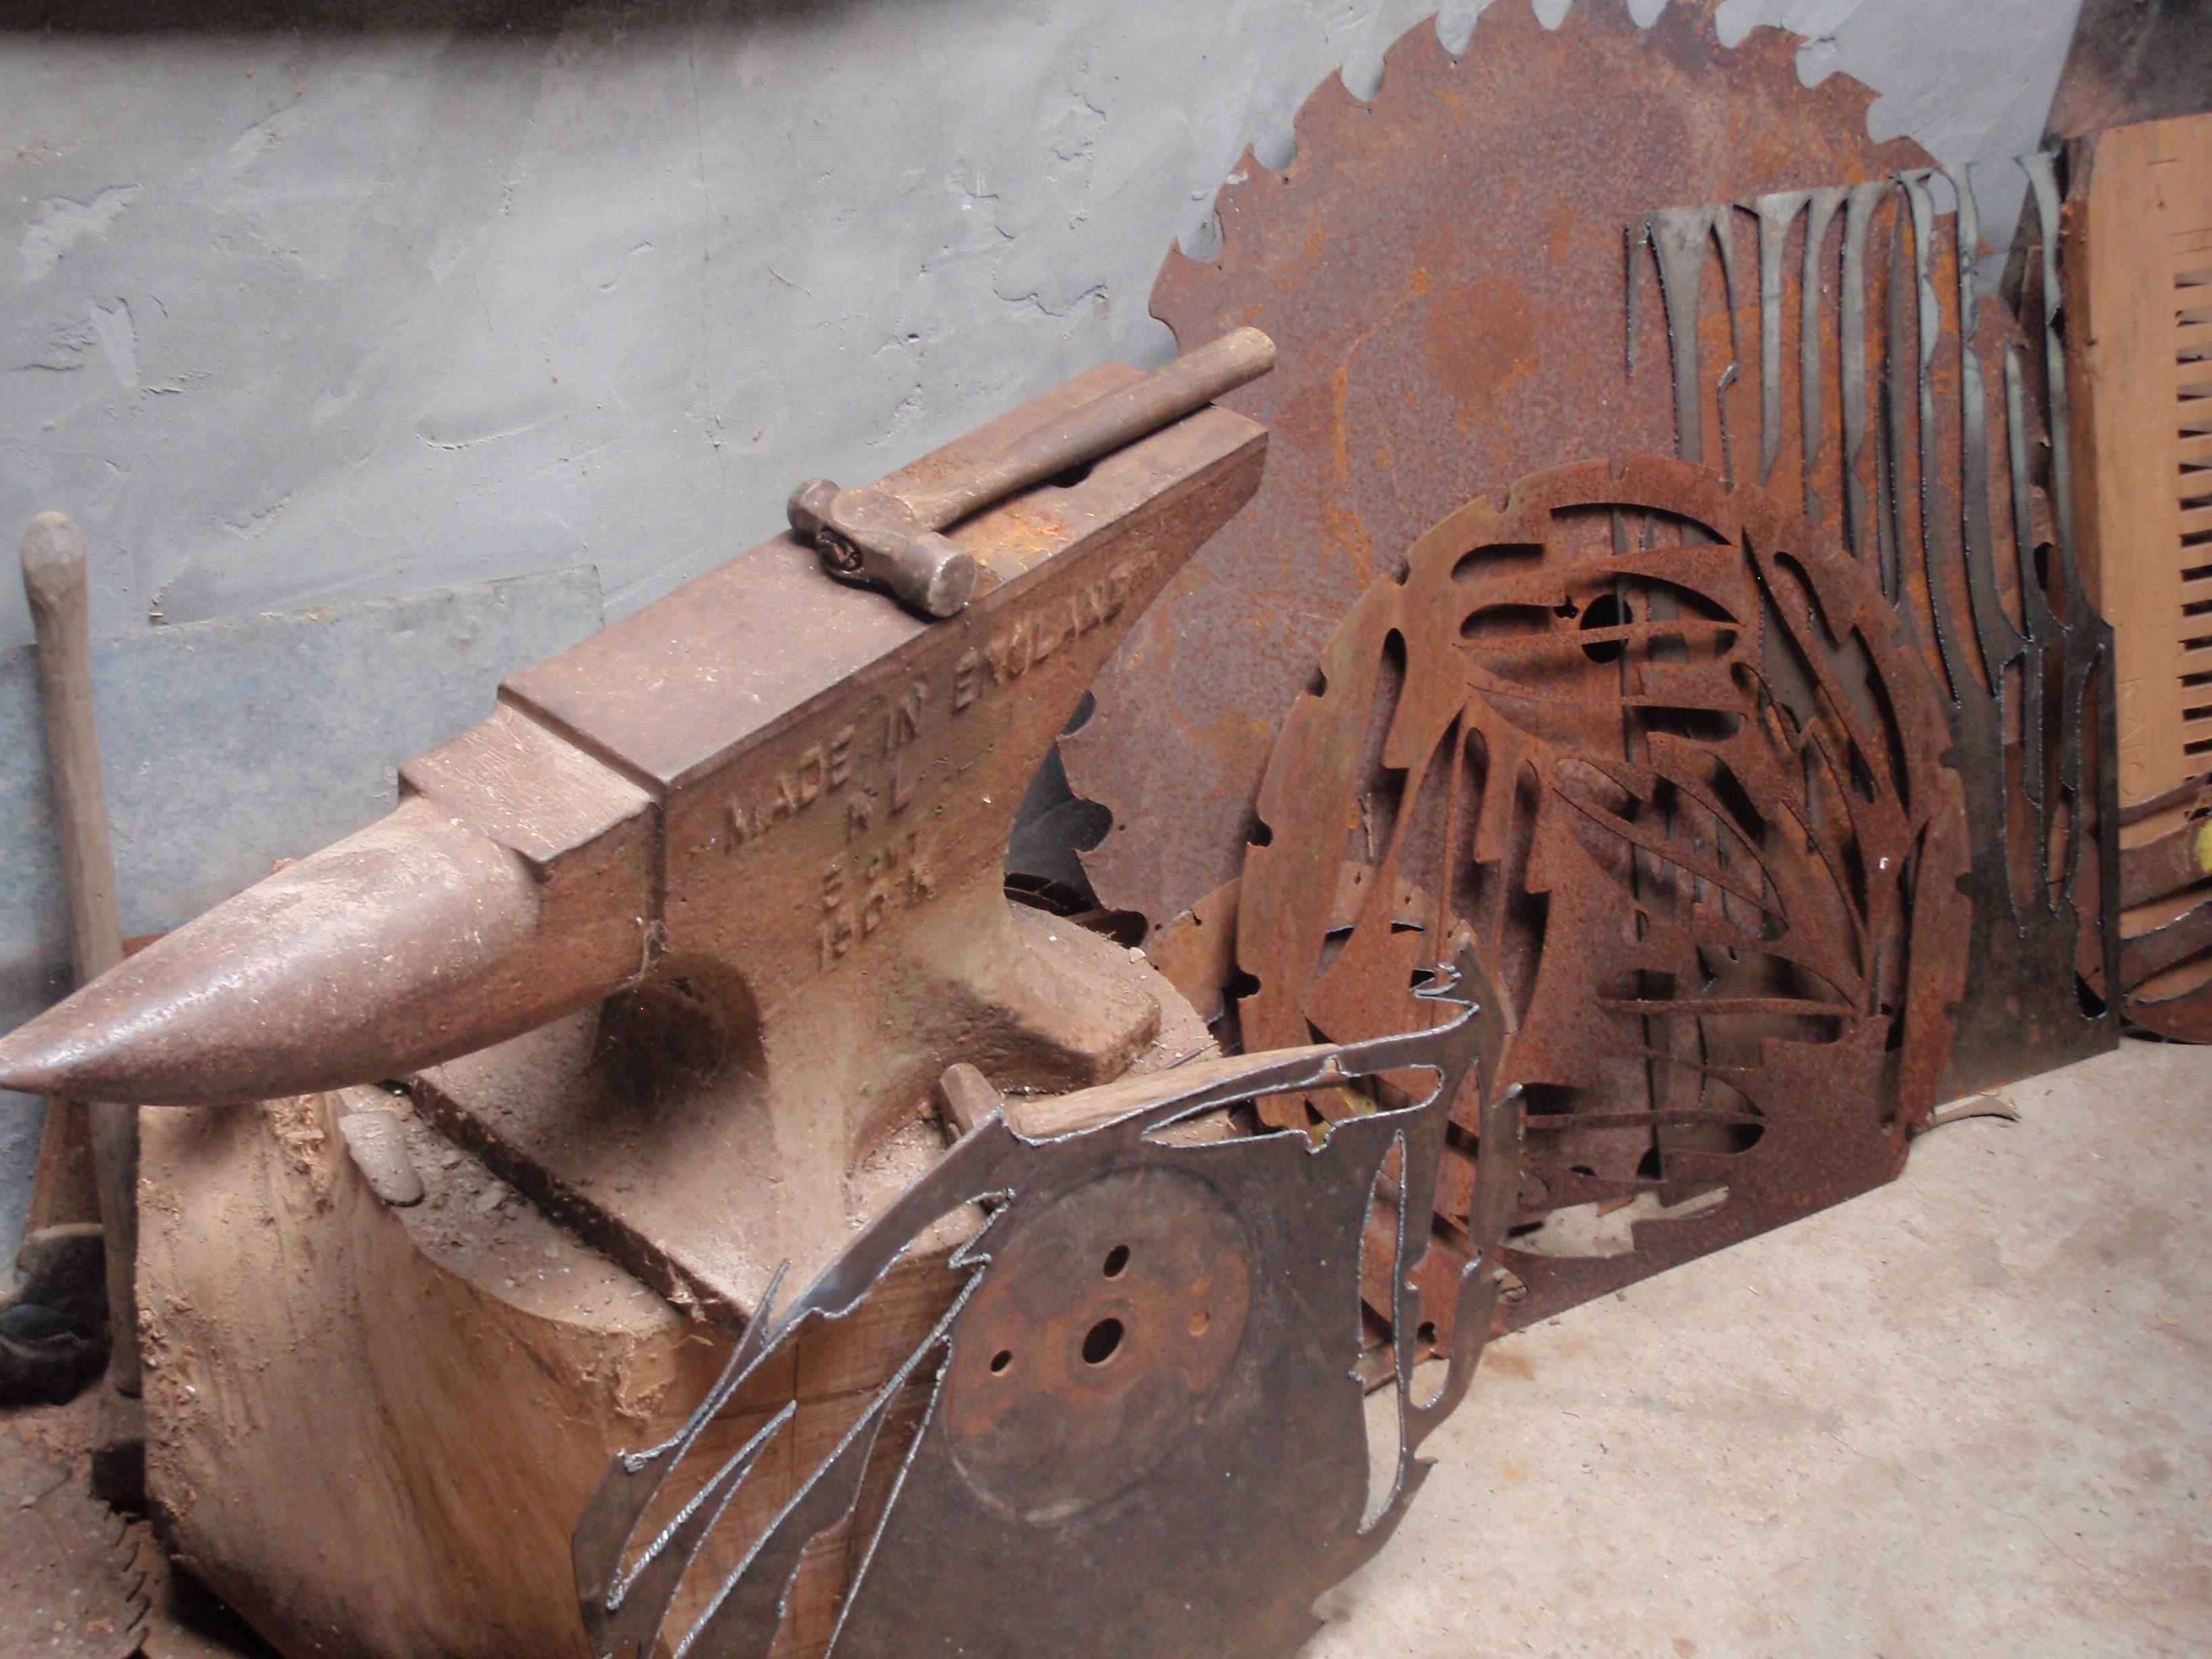 Mill casino saw blade